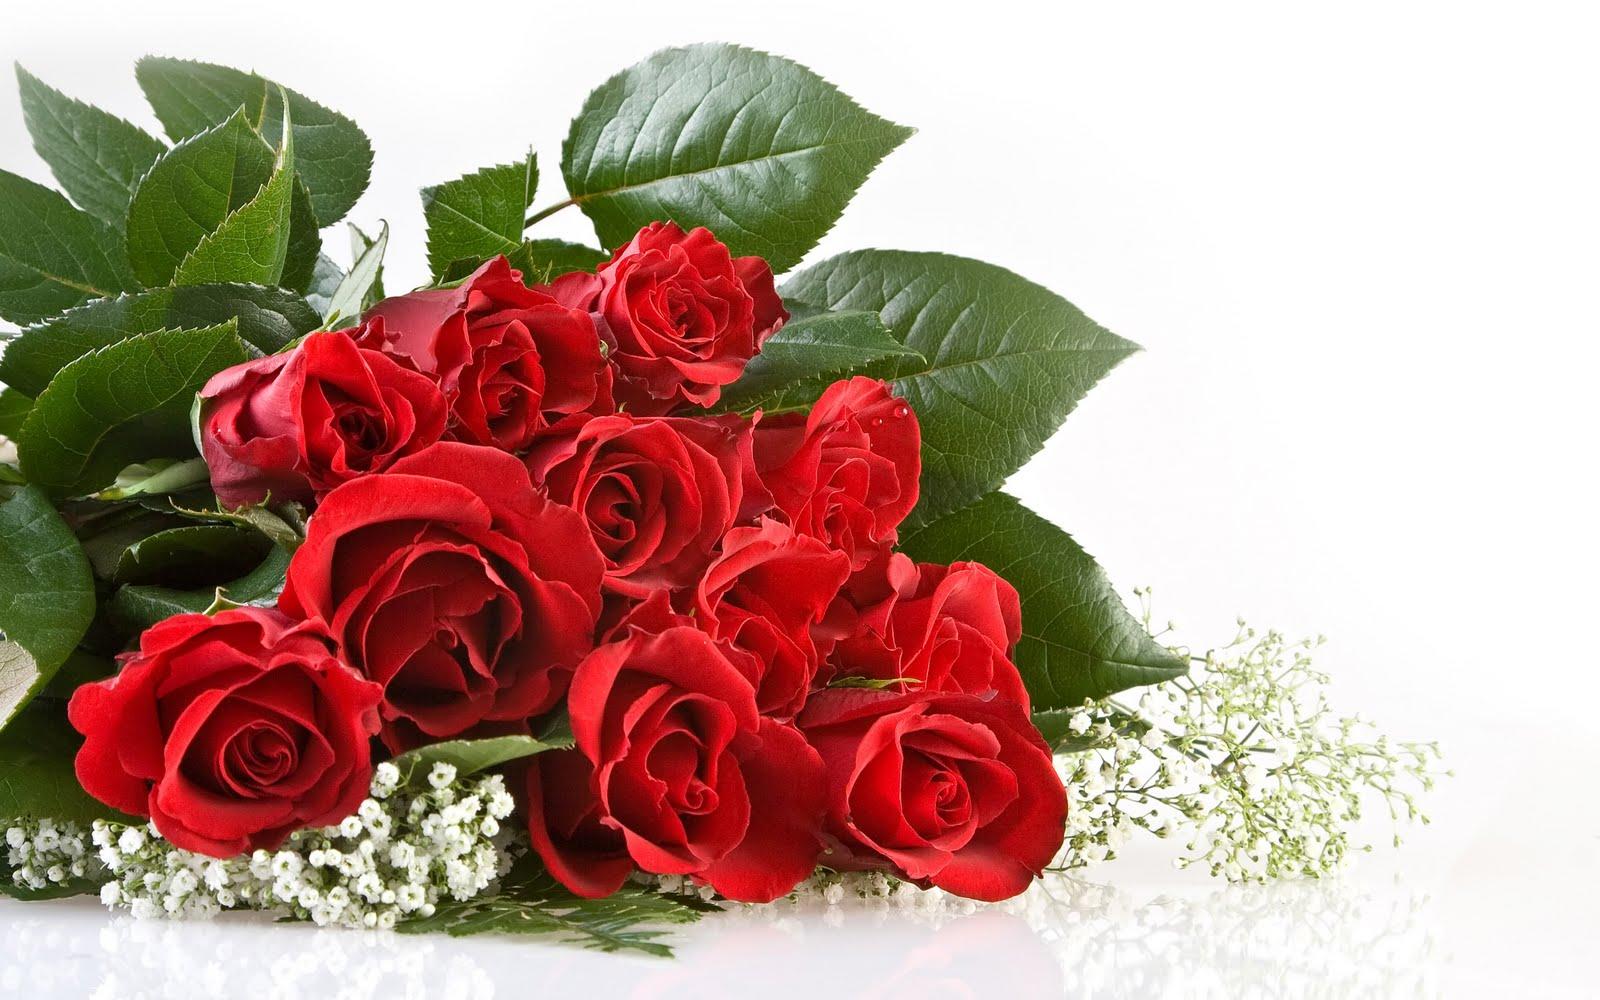 Tumbuh semak-semak mawar dan flora berwarna-warni lainnya dapat menjadi  salah satu bagian yang paling berharga dari berkebun untuk kesenangan. c9f250ecc4